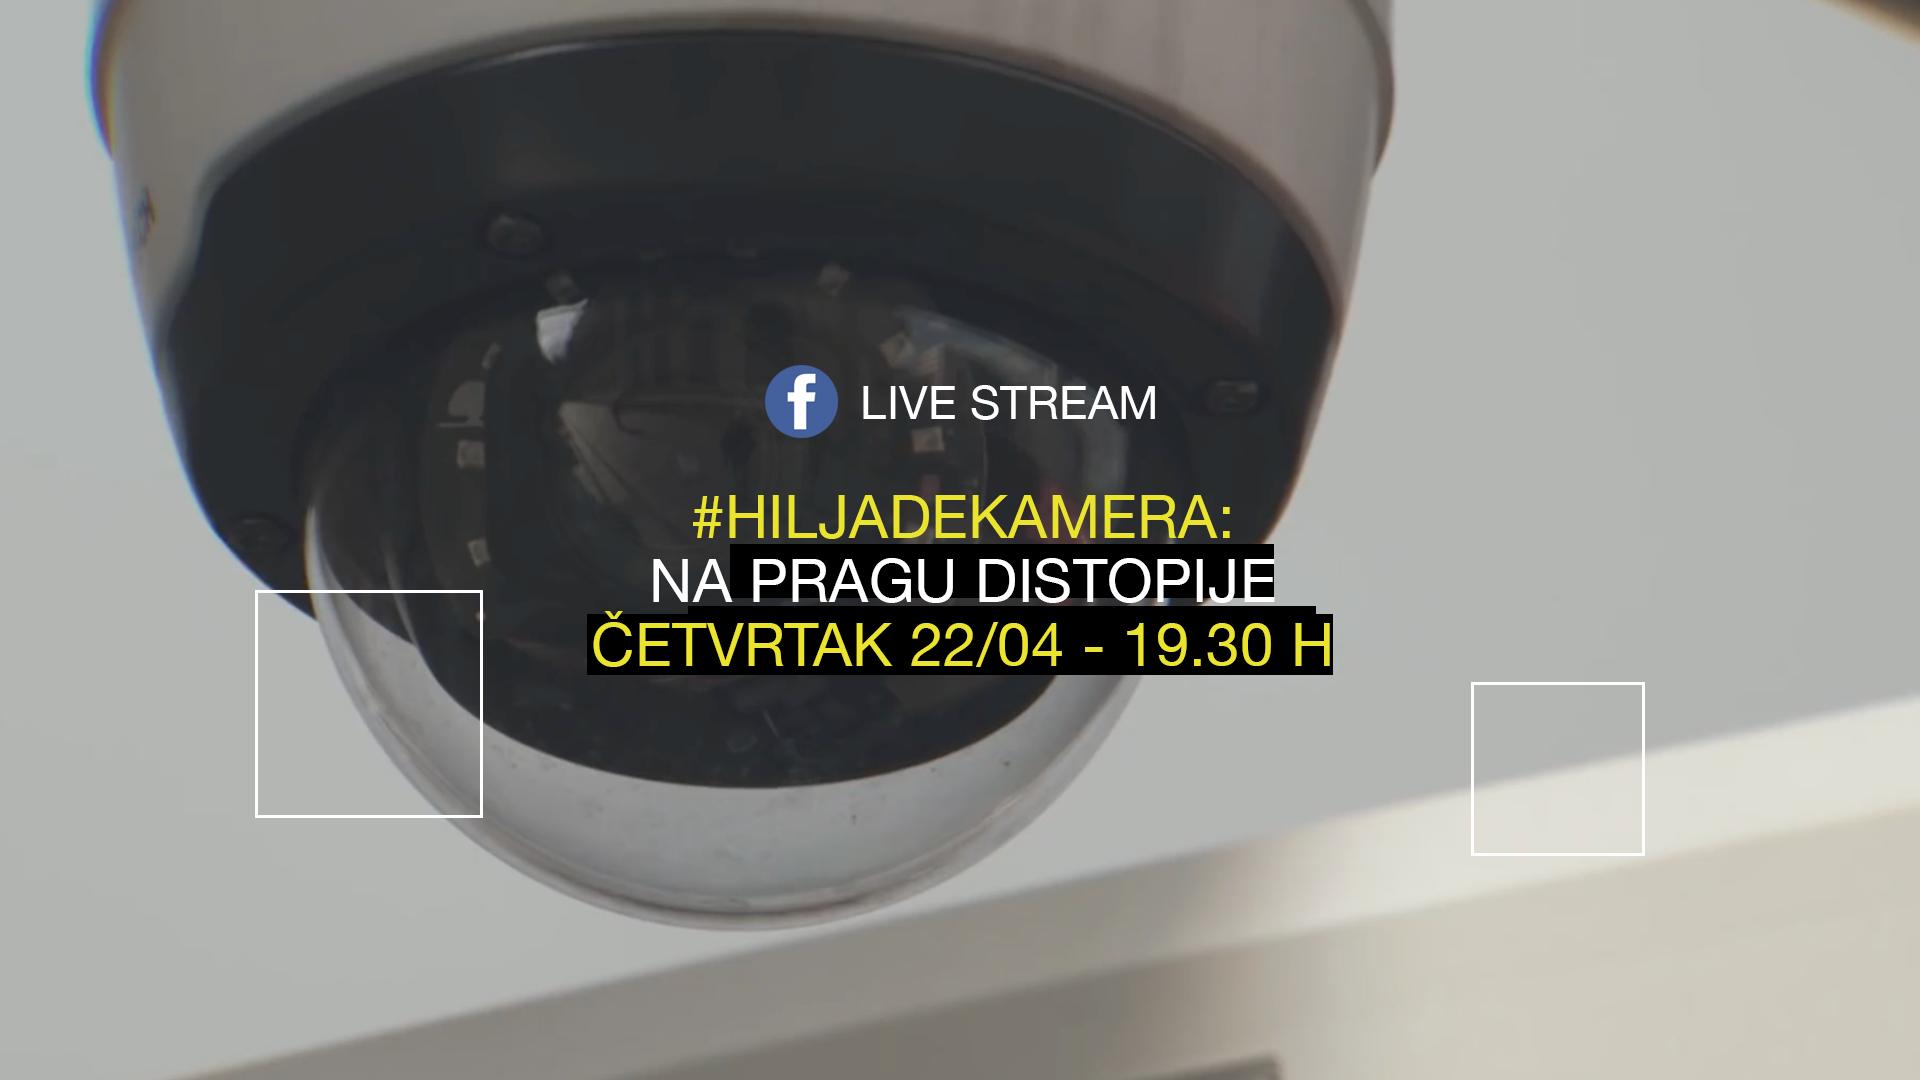 fb-live-stream-22